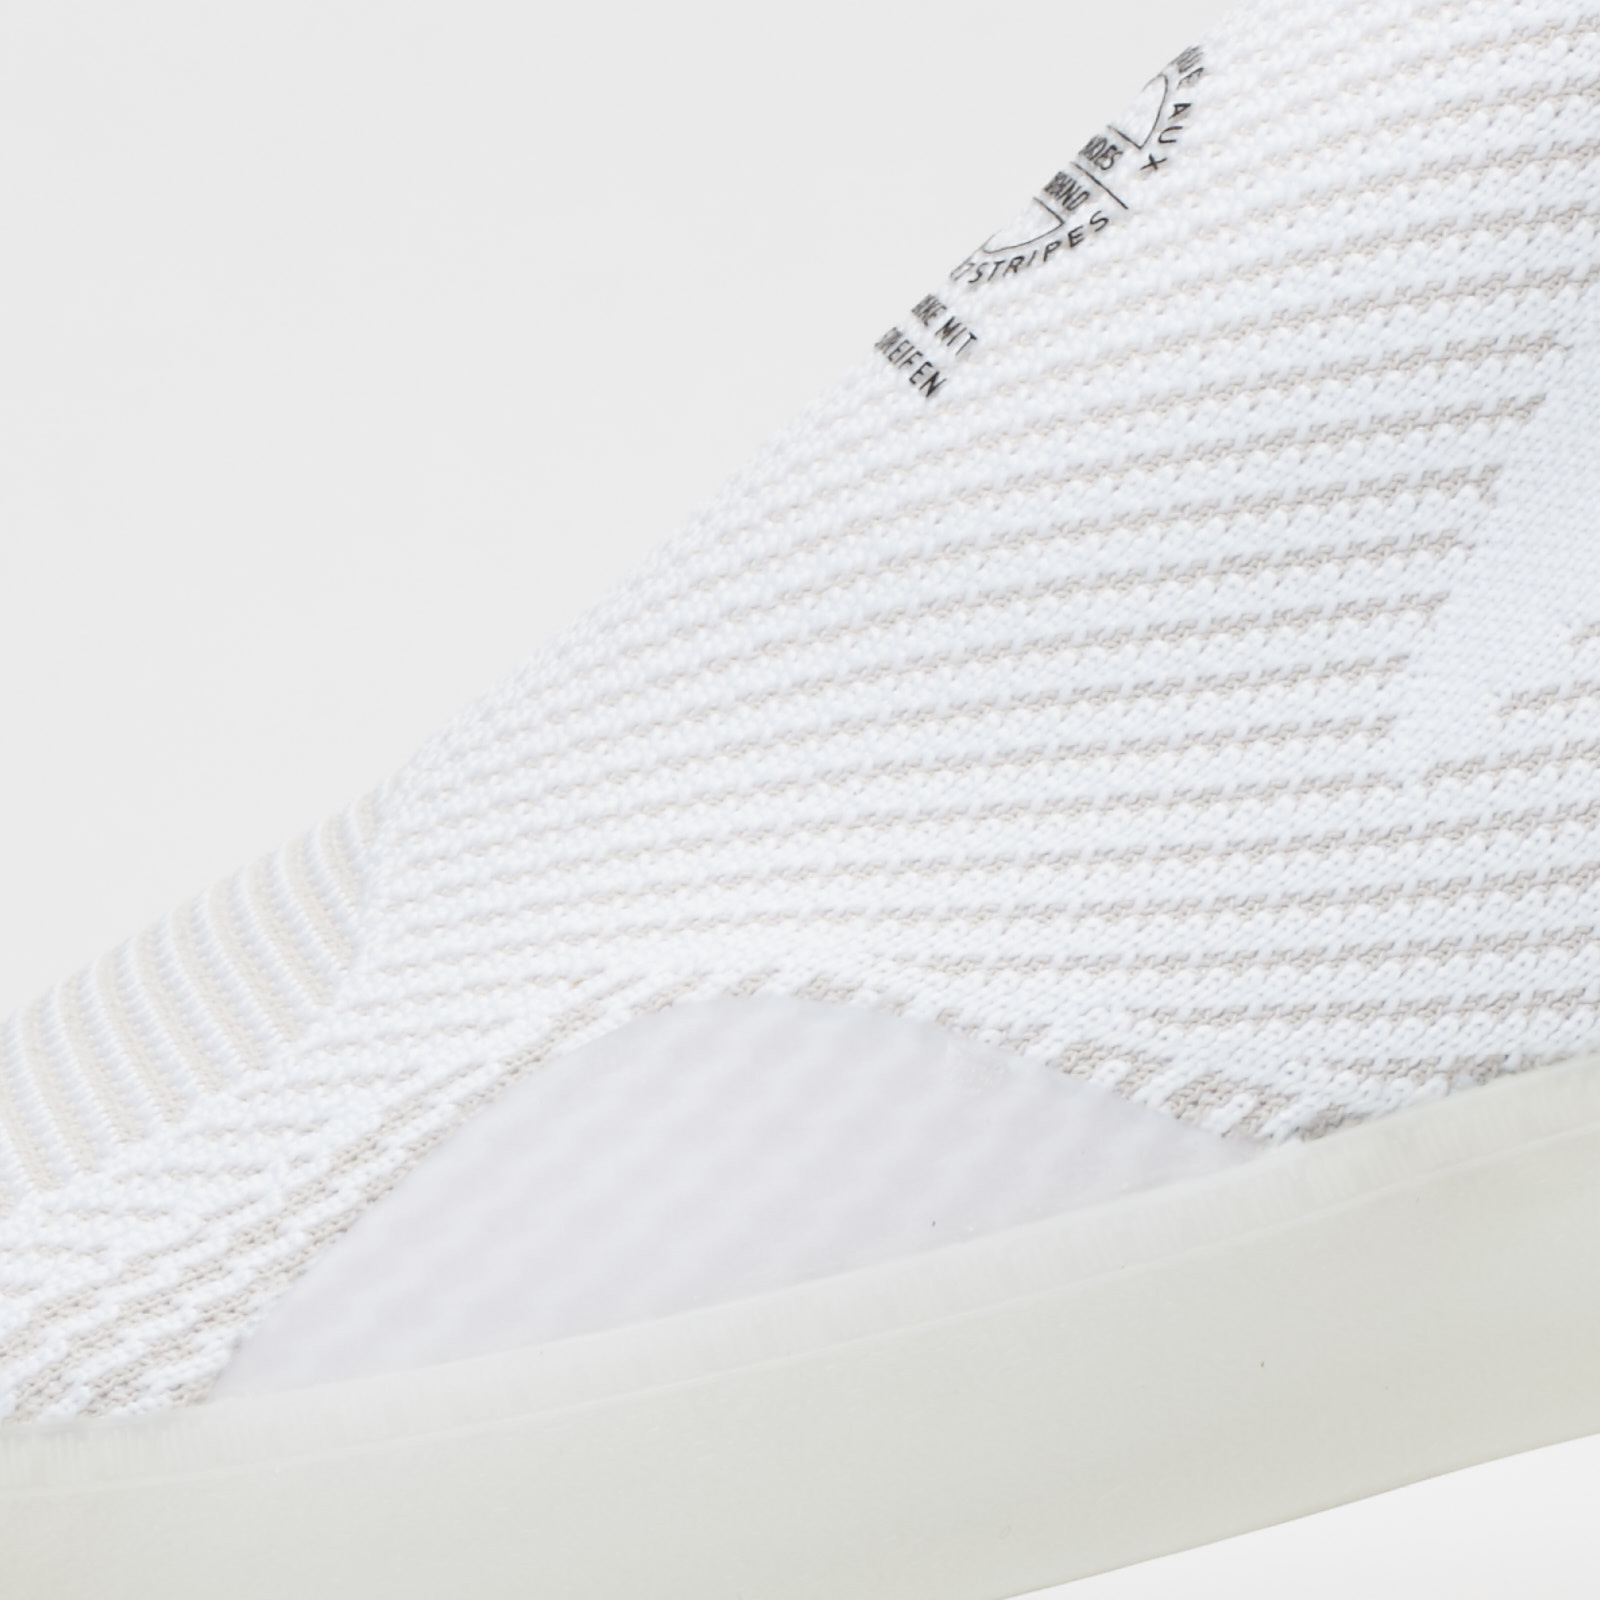 best sneakers aaea2 e822d ... adidas Originals 3ST.002 PK ...